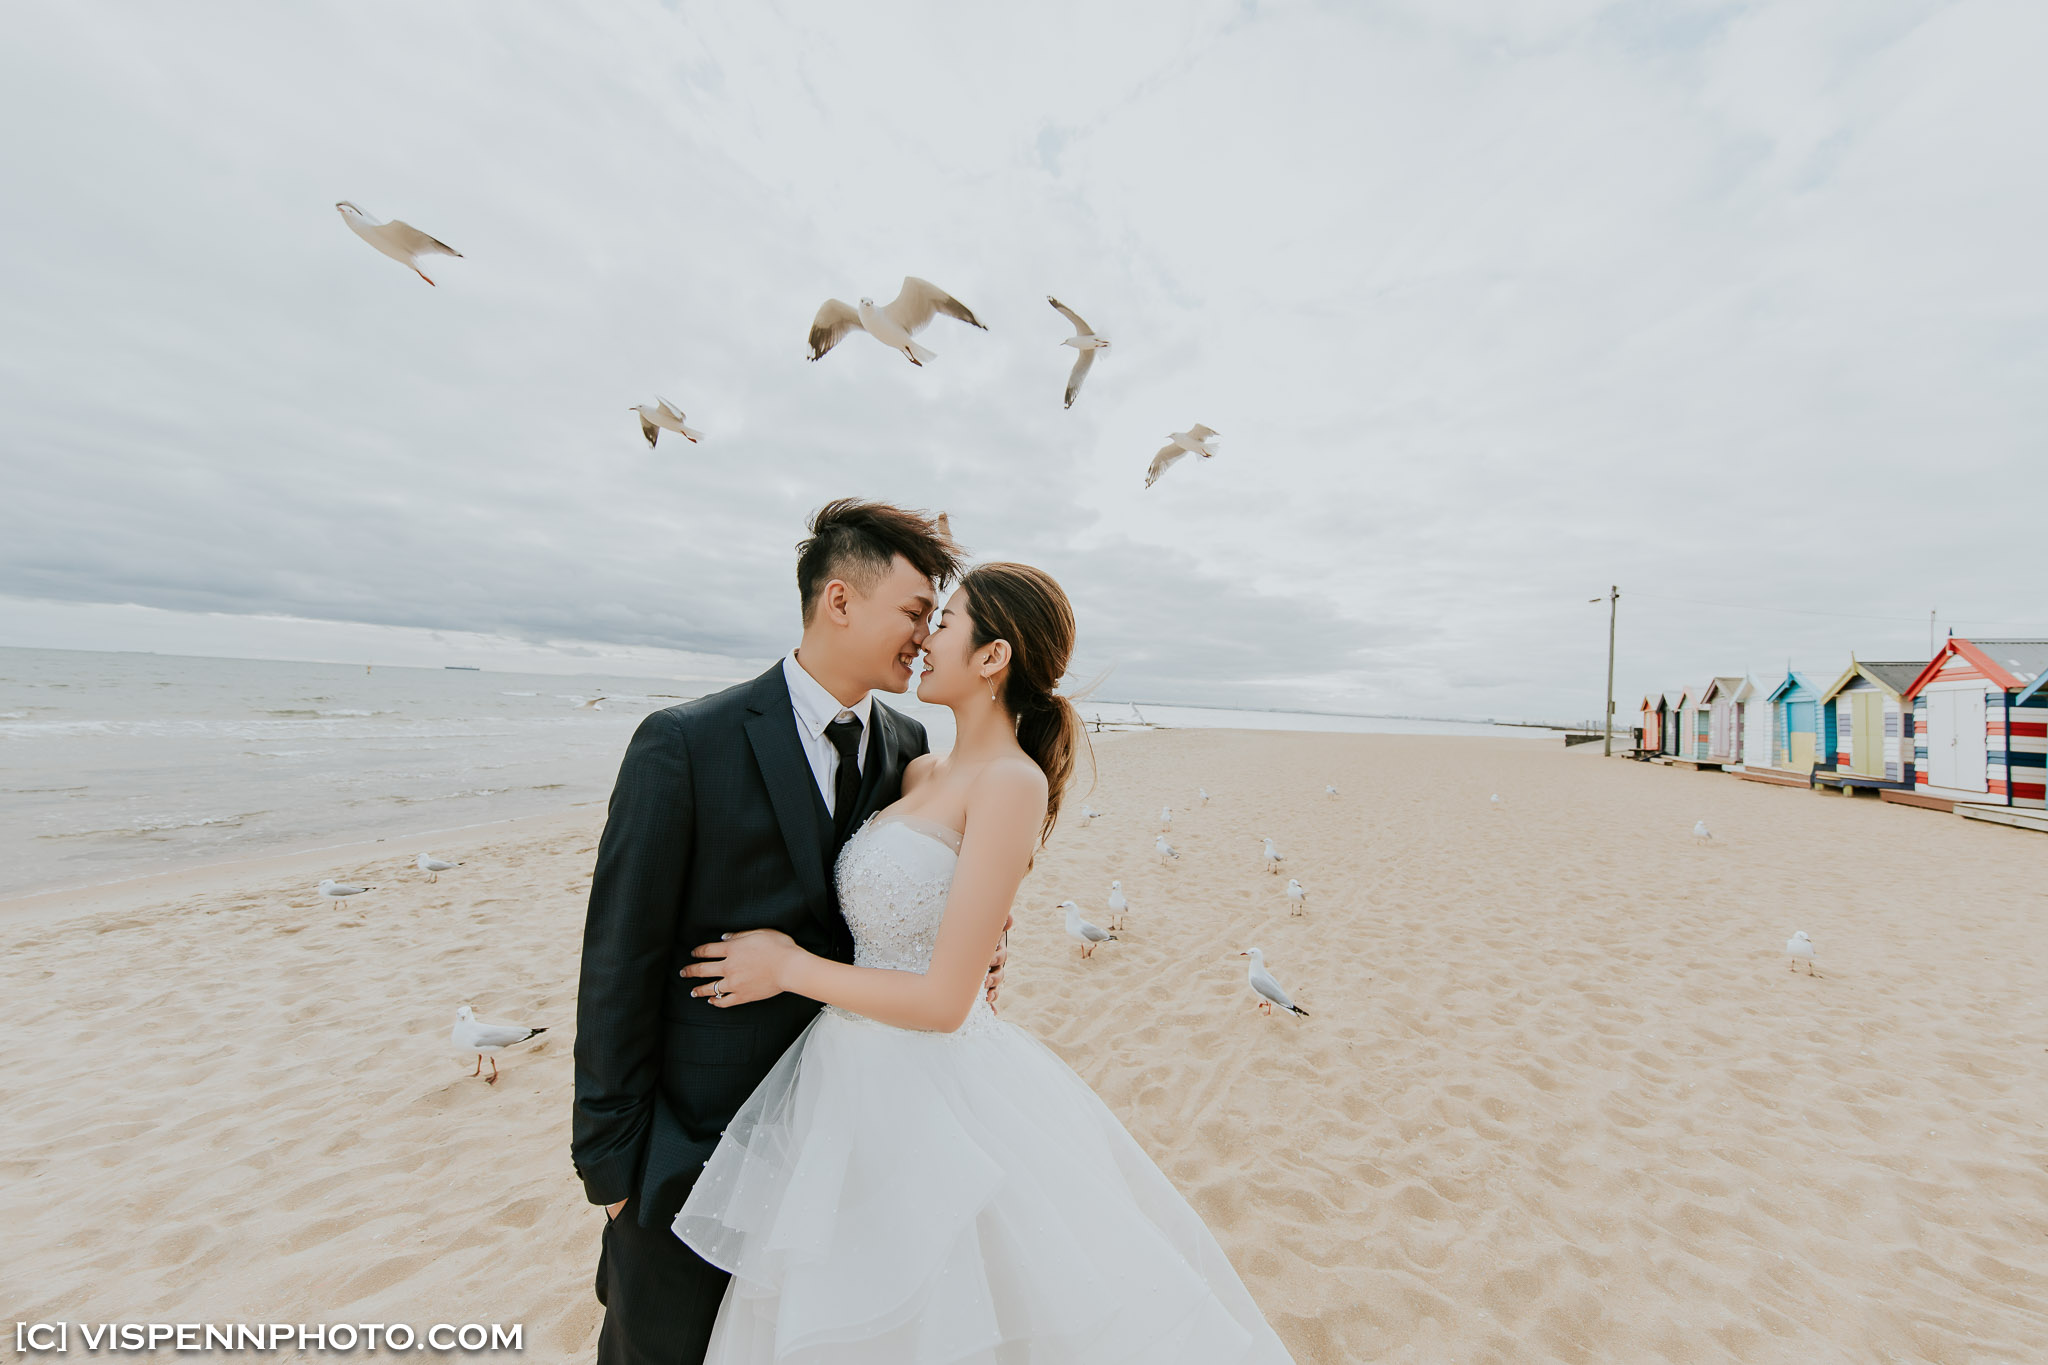 PRE WEDDING Photography Melbourne GiGi 7837 EOSR ZHPENN